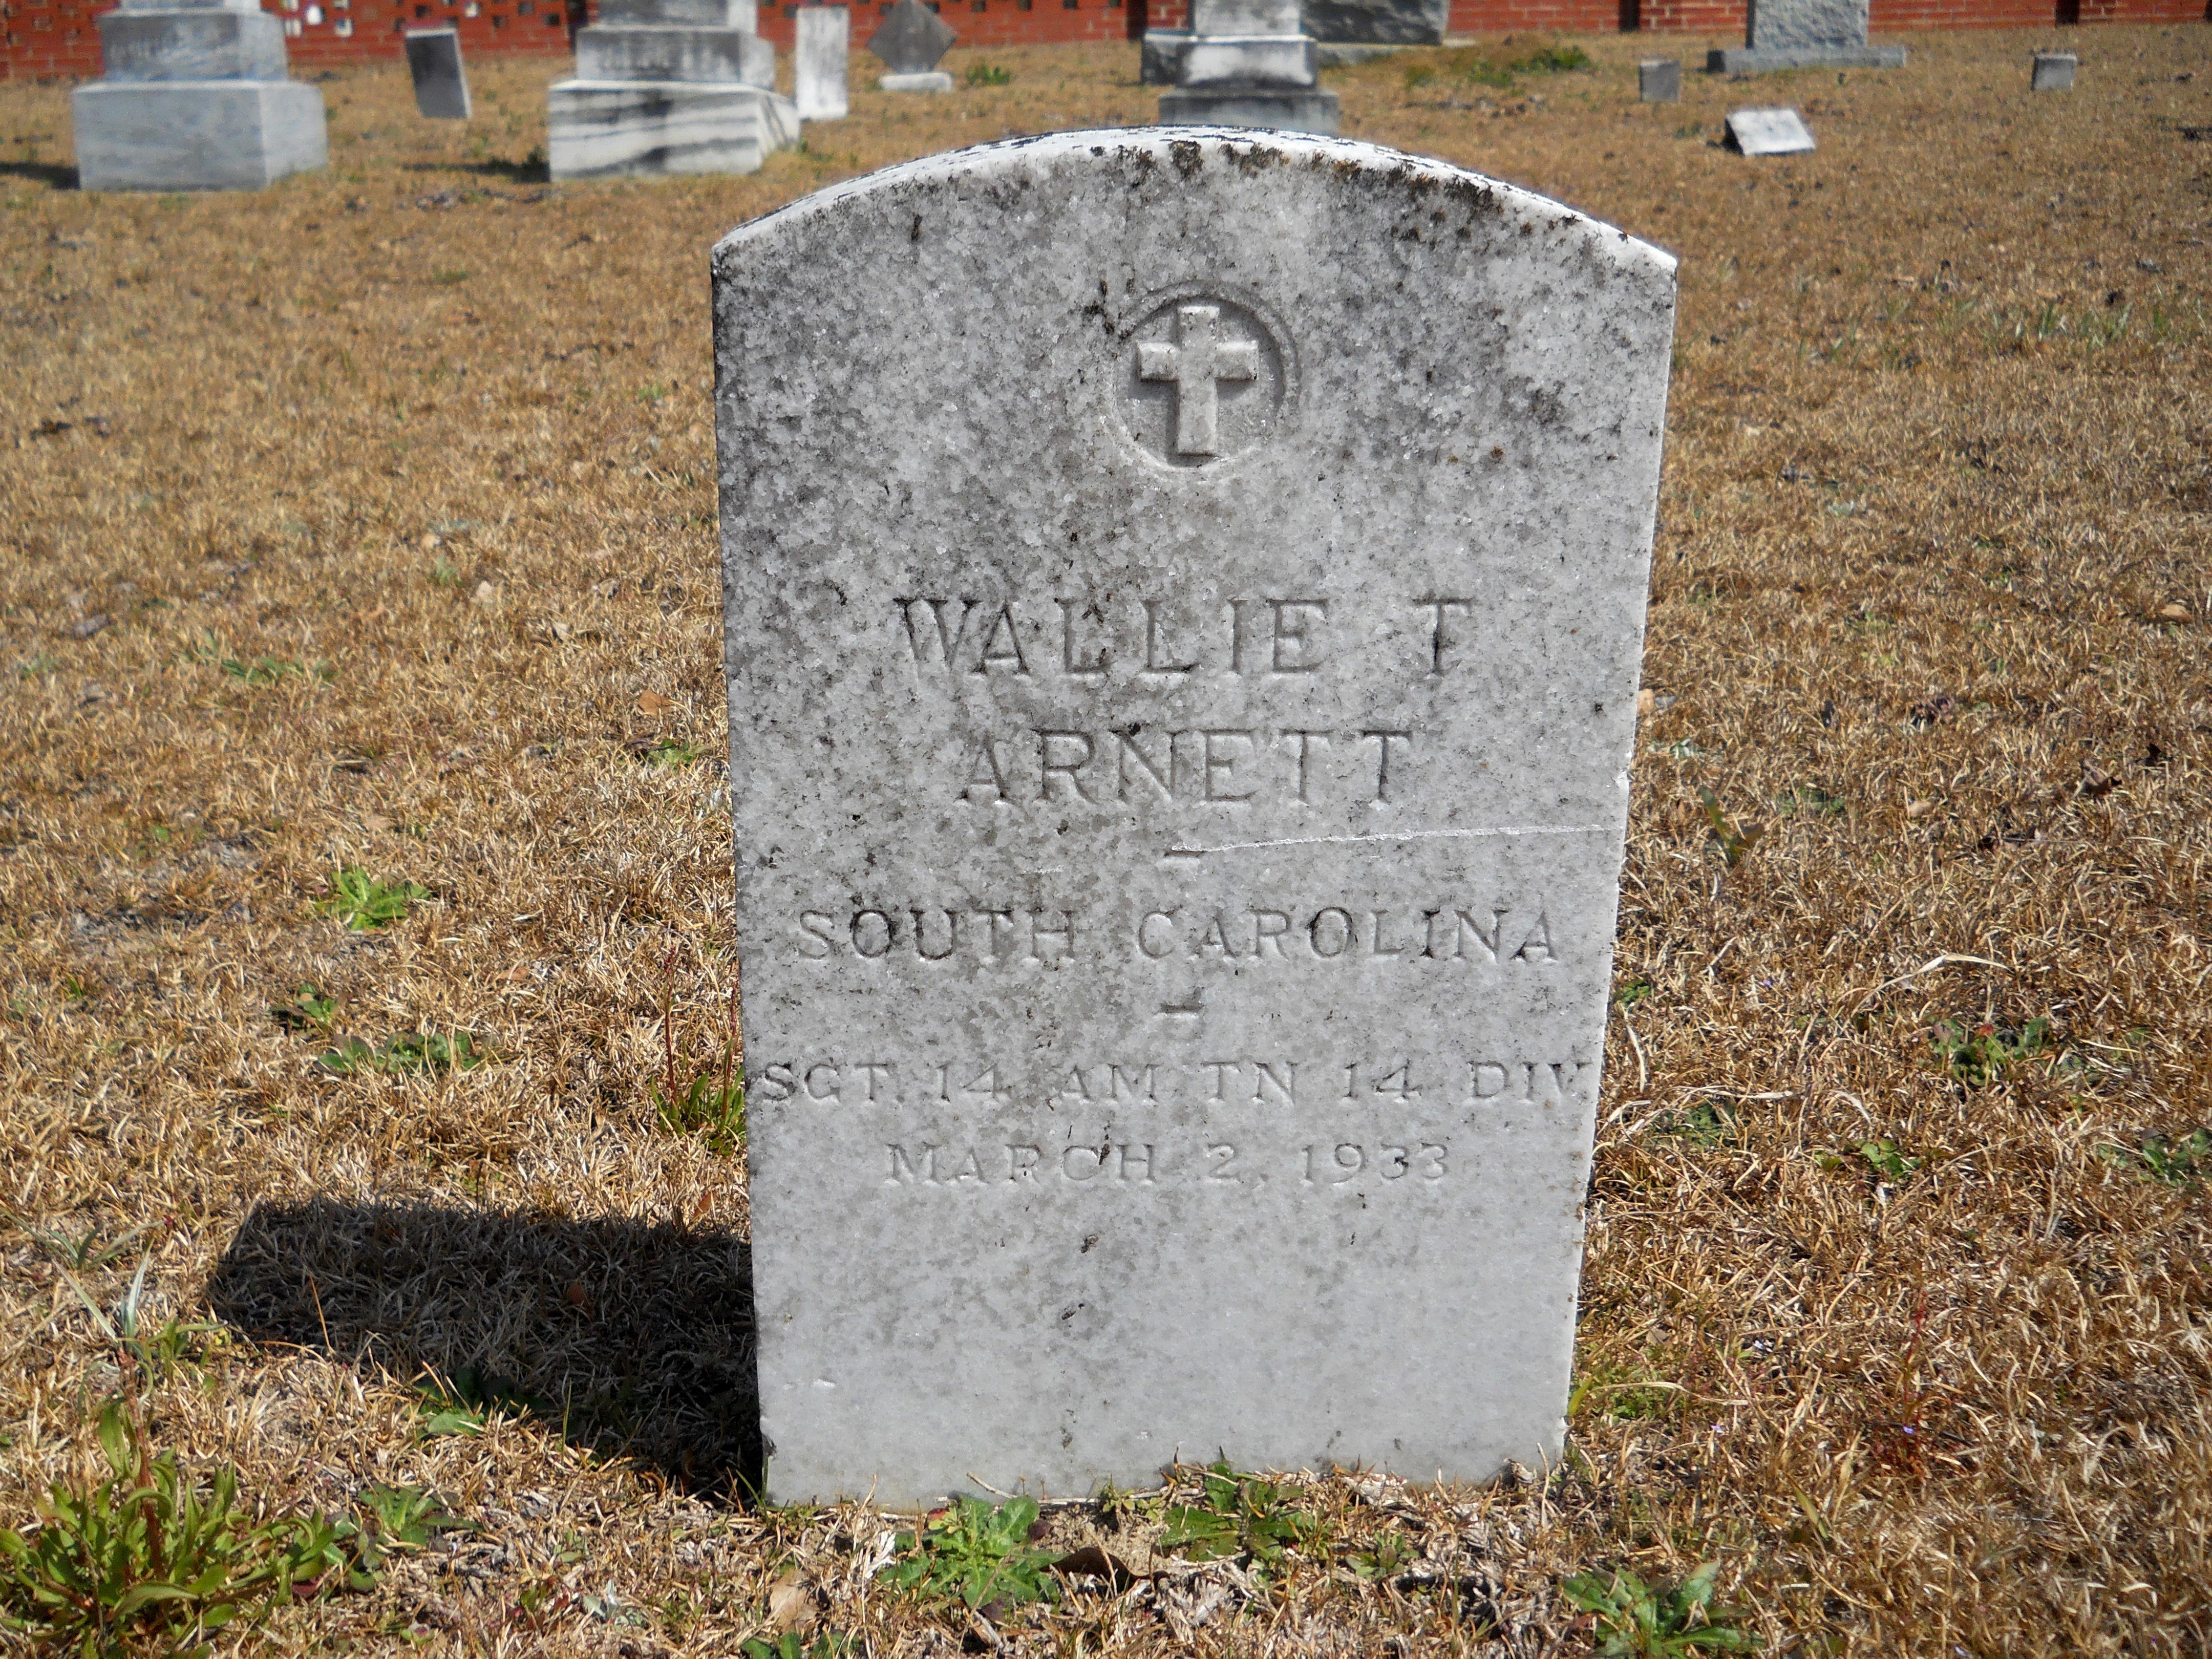 Wallie Thomas Arnett